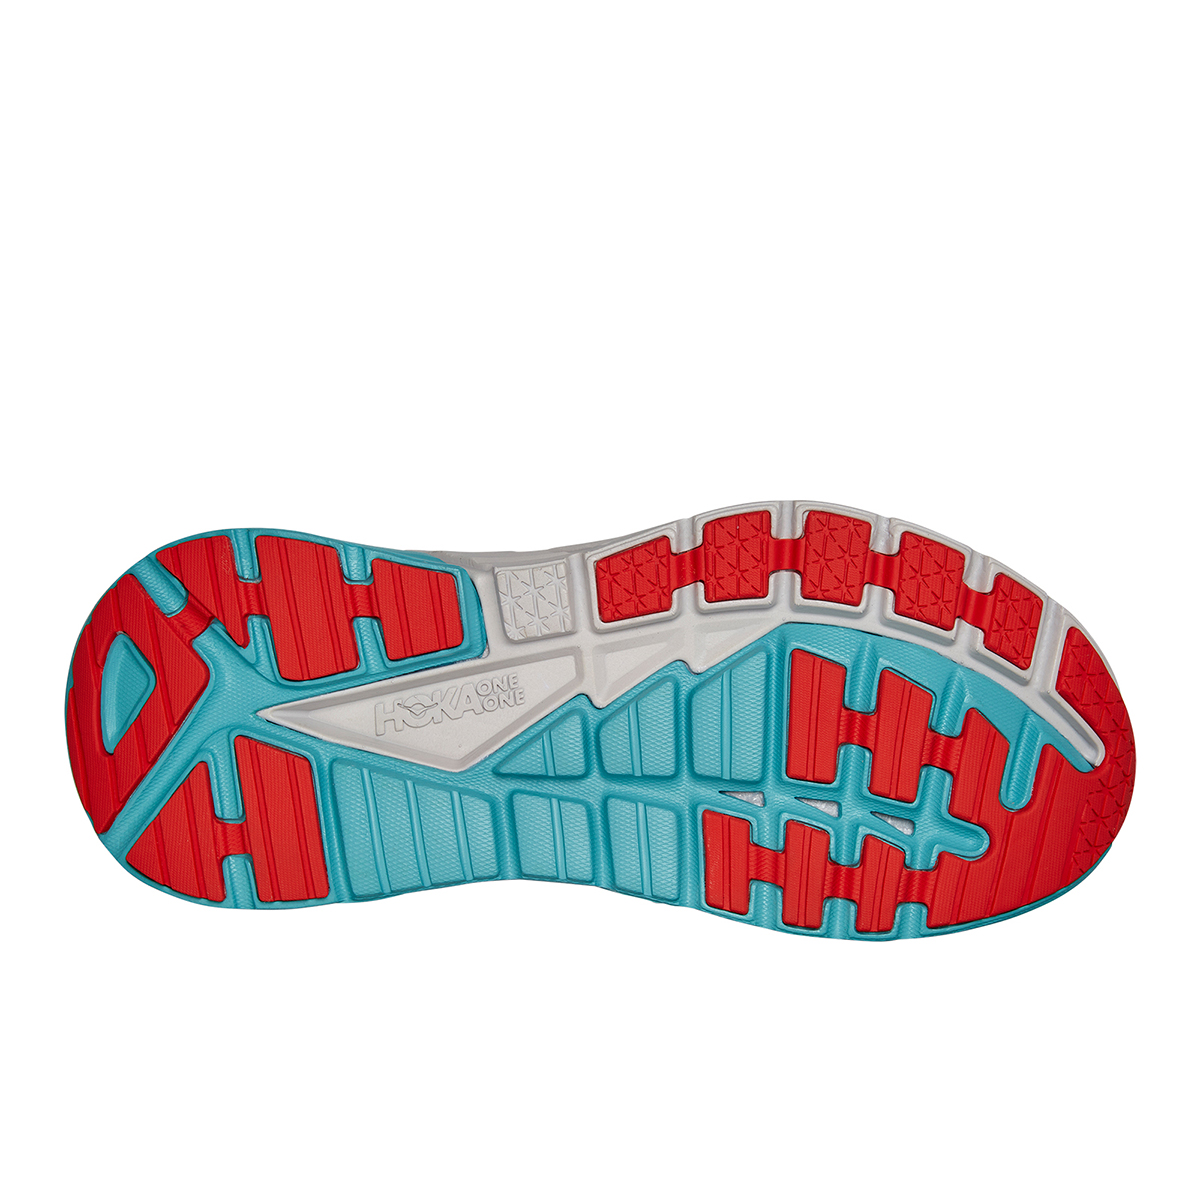 Men's Hoka One One Gaviota 3 Running Shoe - Color: Real Teal / Aquarelle - Size: 7 - Width: Regular, Real Teal / Aquarelle, large, image 4